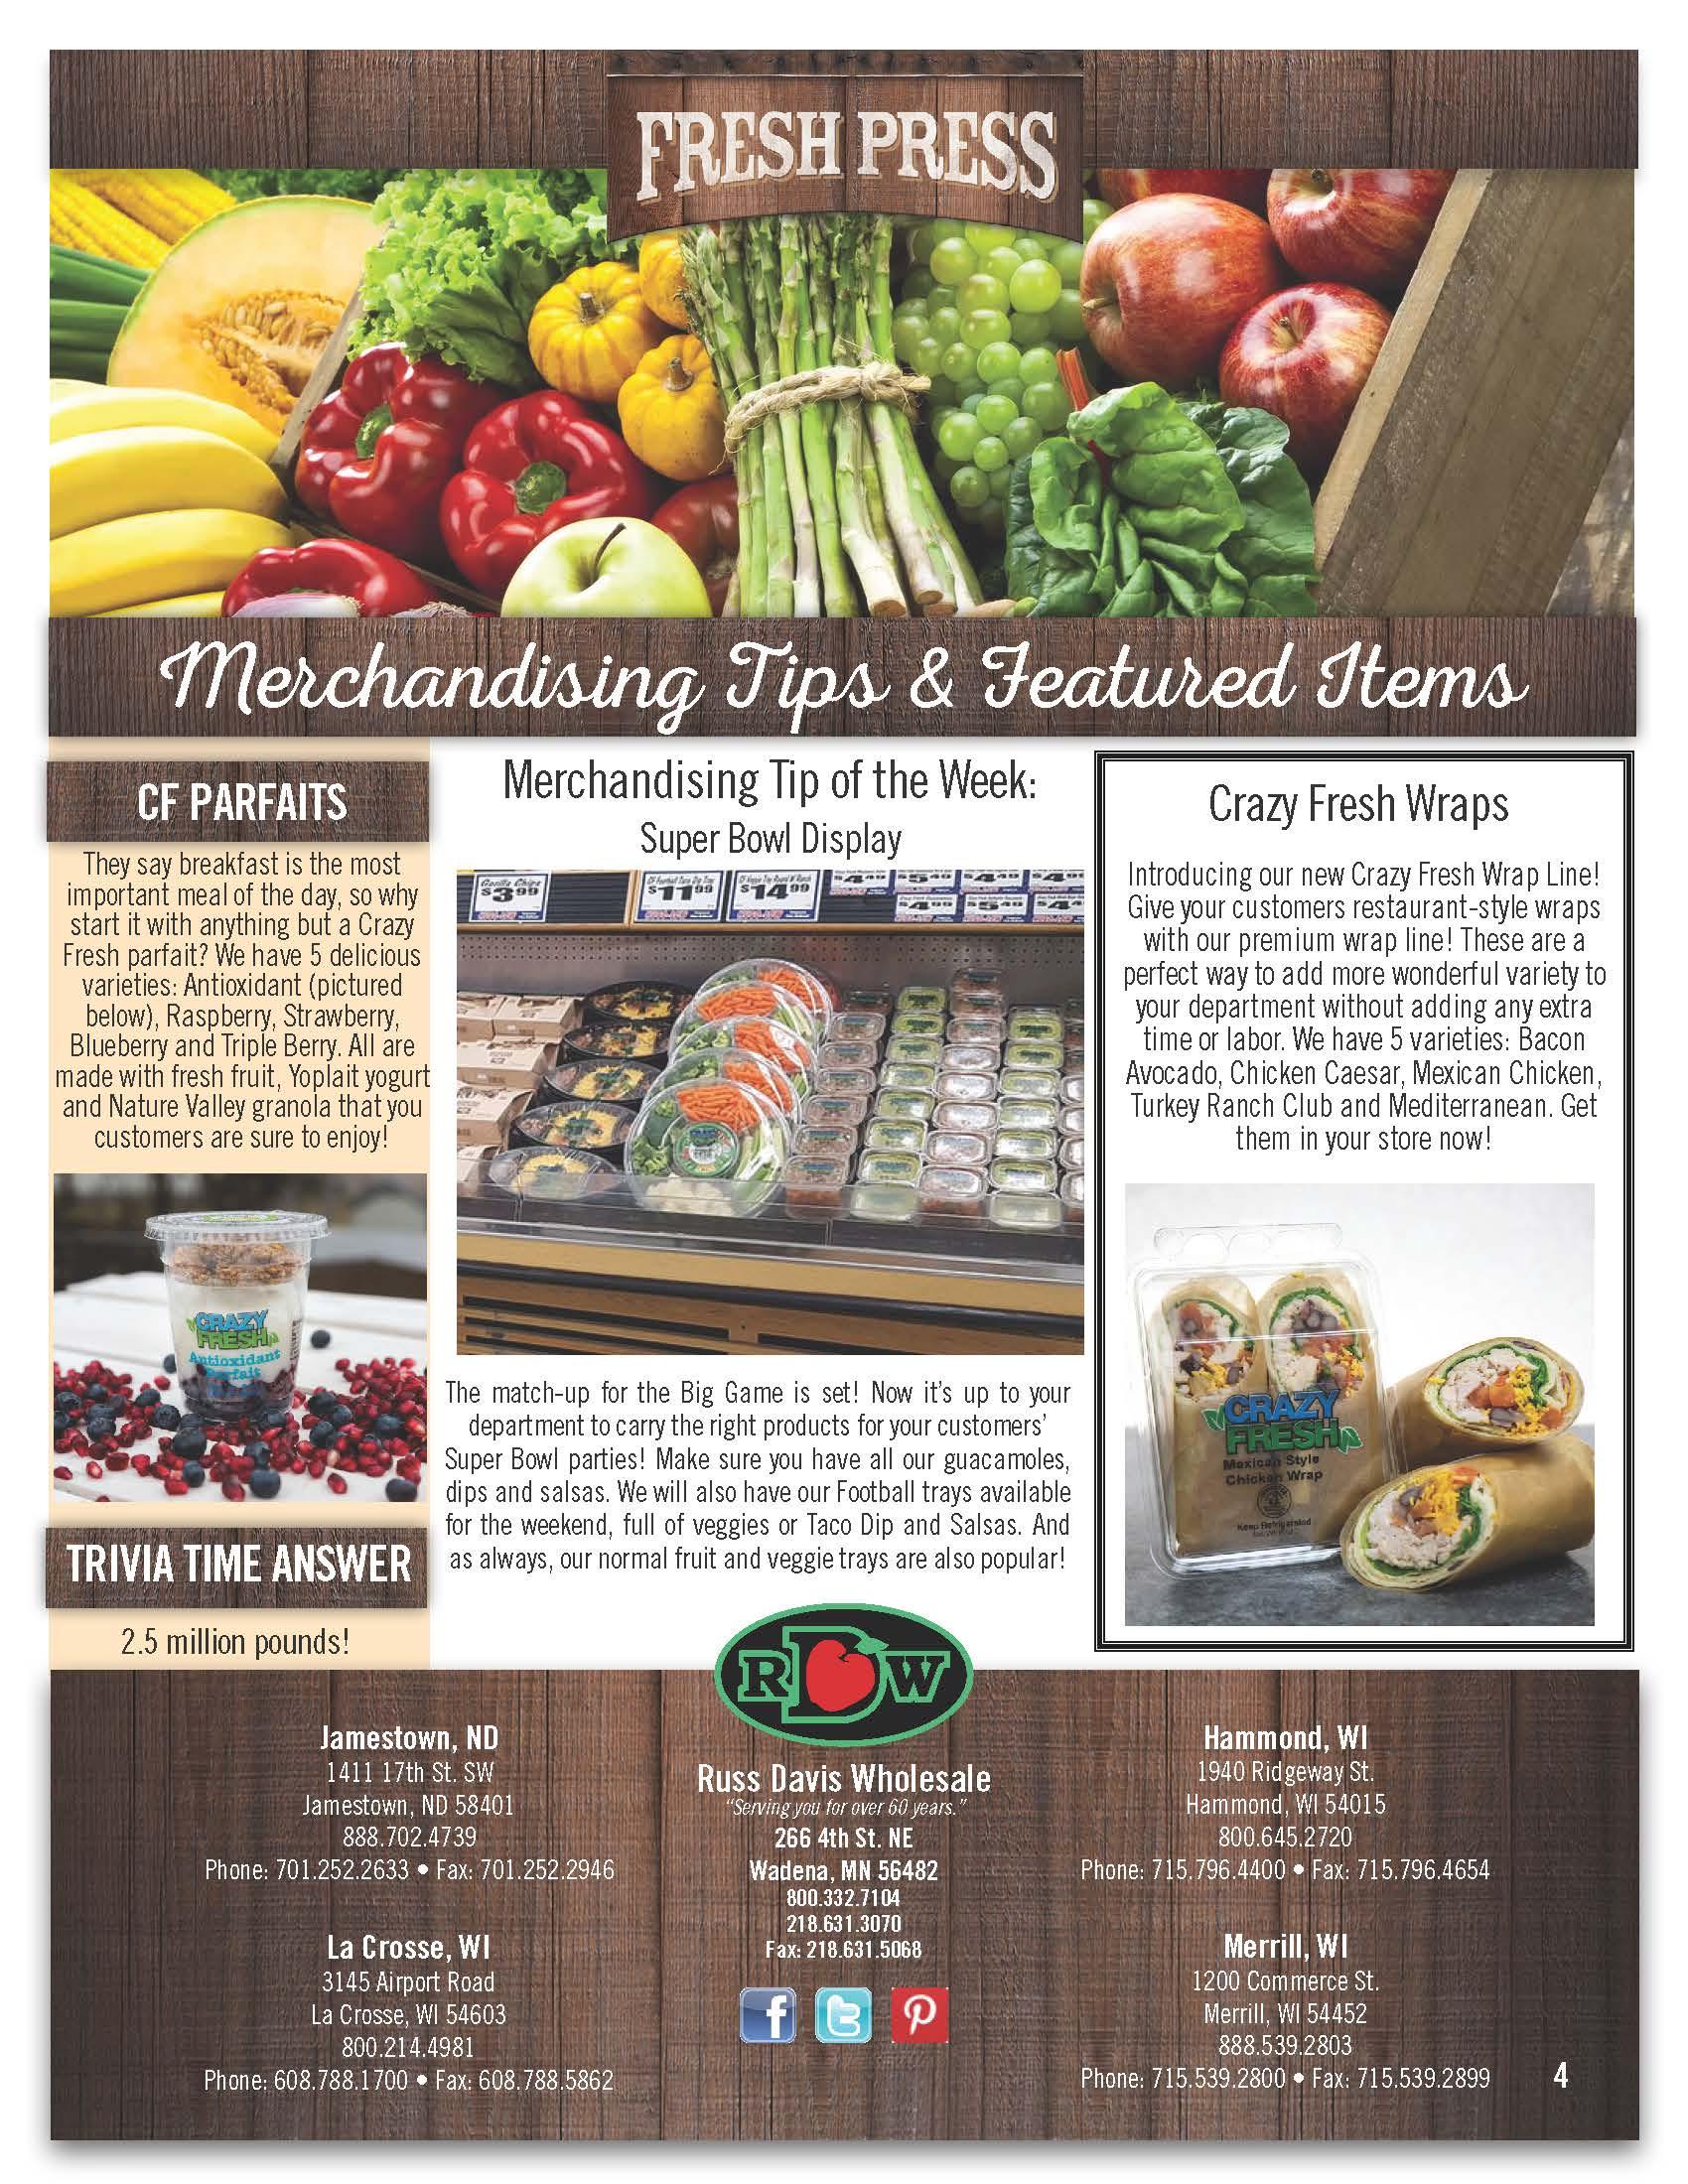 RDW_Fresh_Press_Jan23_2019_Page_4.jpg